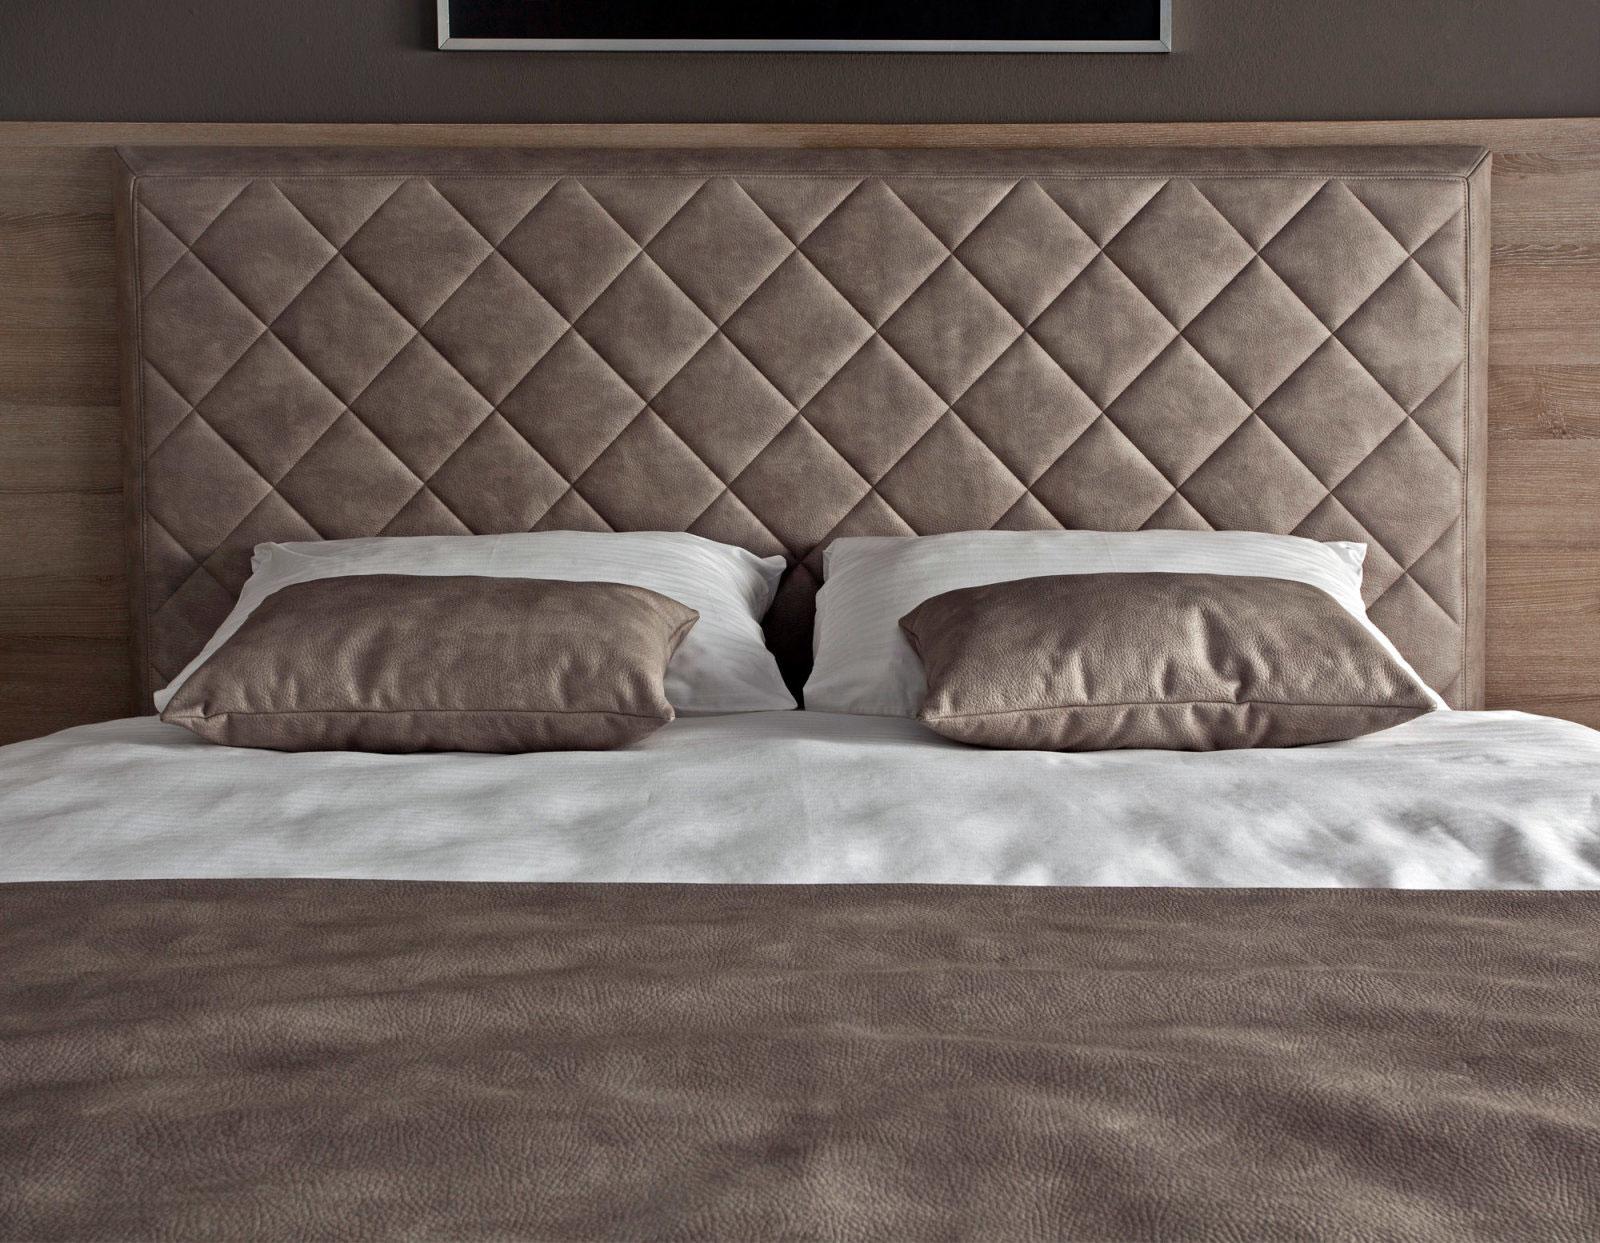 kopfteile ideal f r das boxspringbett hsj. Black Bedroom Furniture Sets. Home Design Ideas